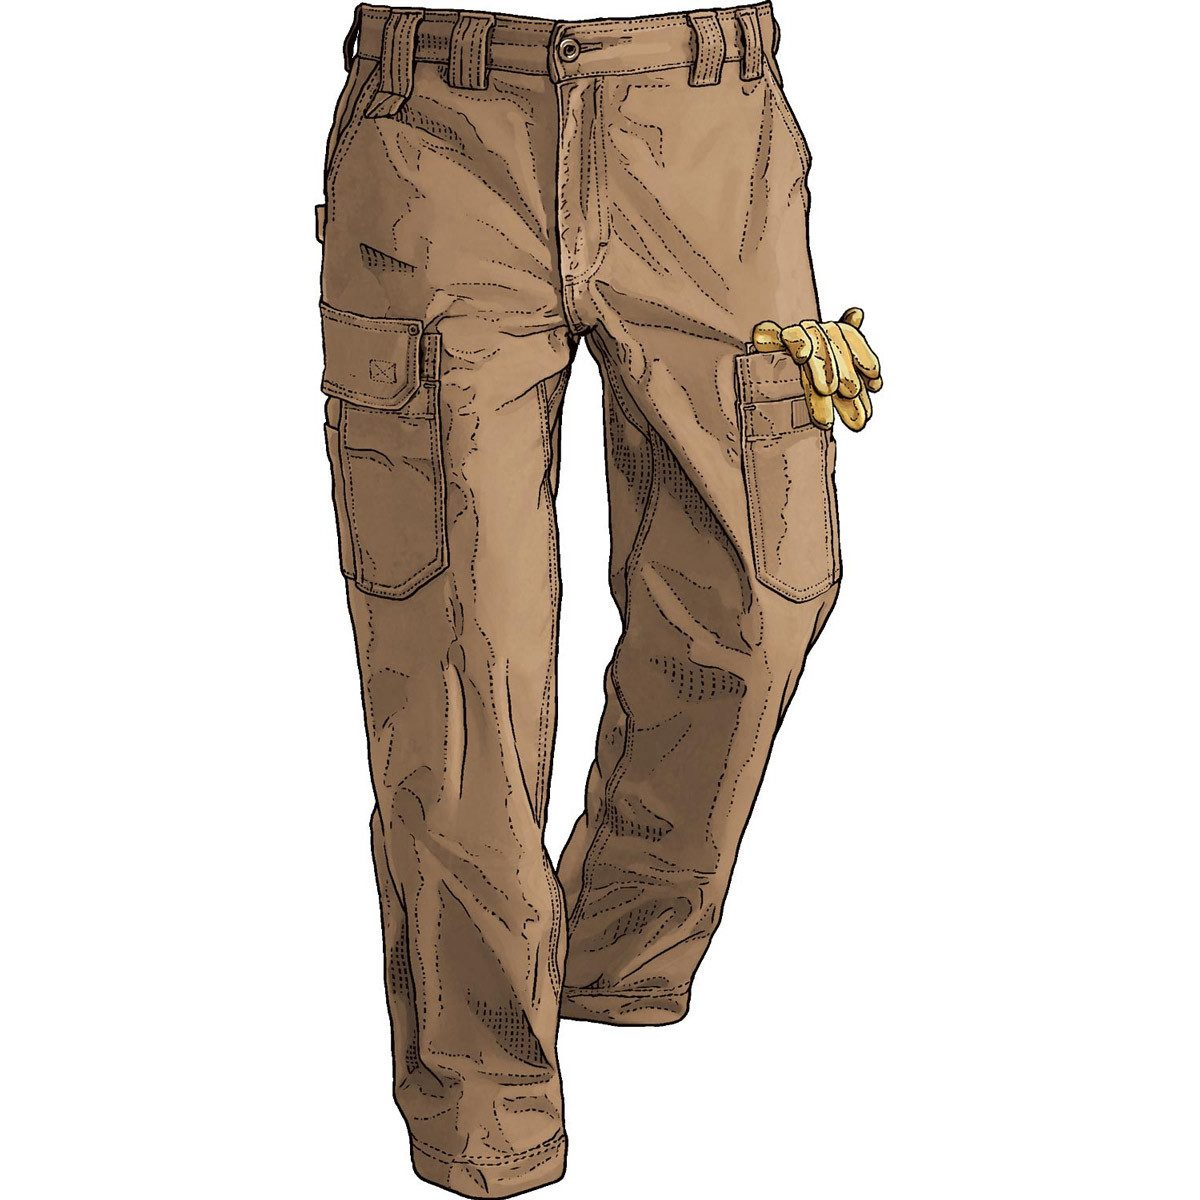 45507_brn-1200x1200 Durable Work Pants